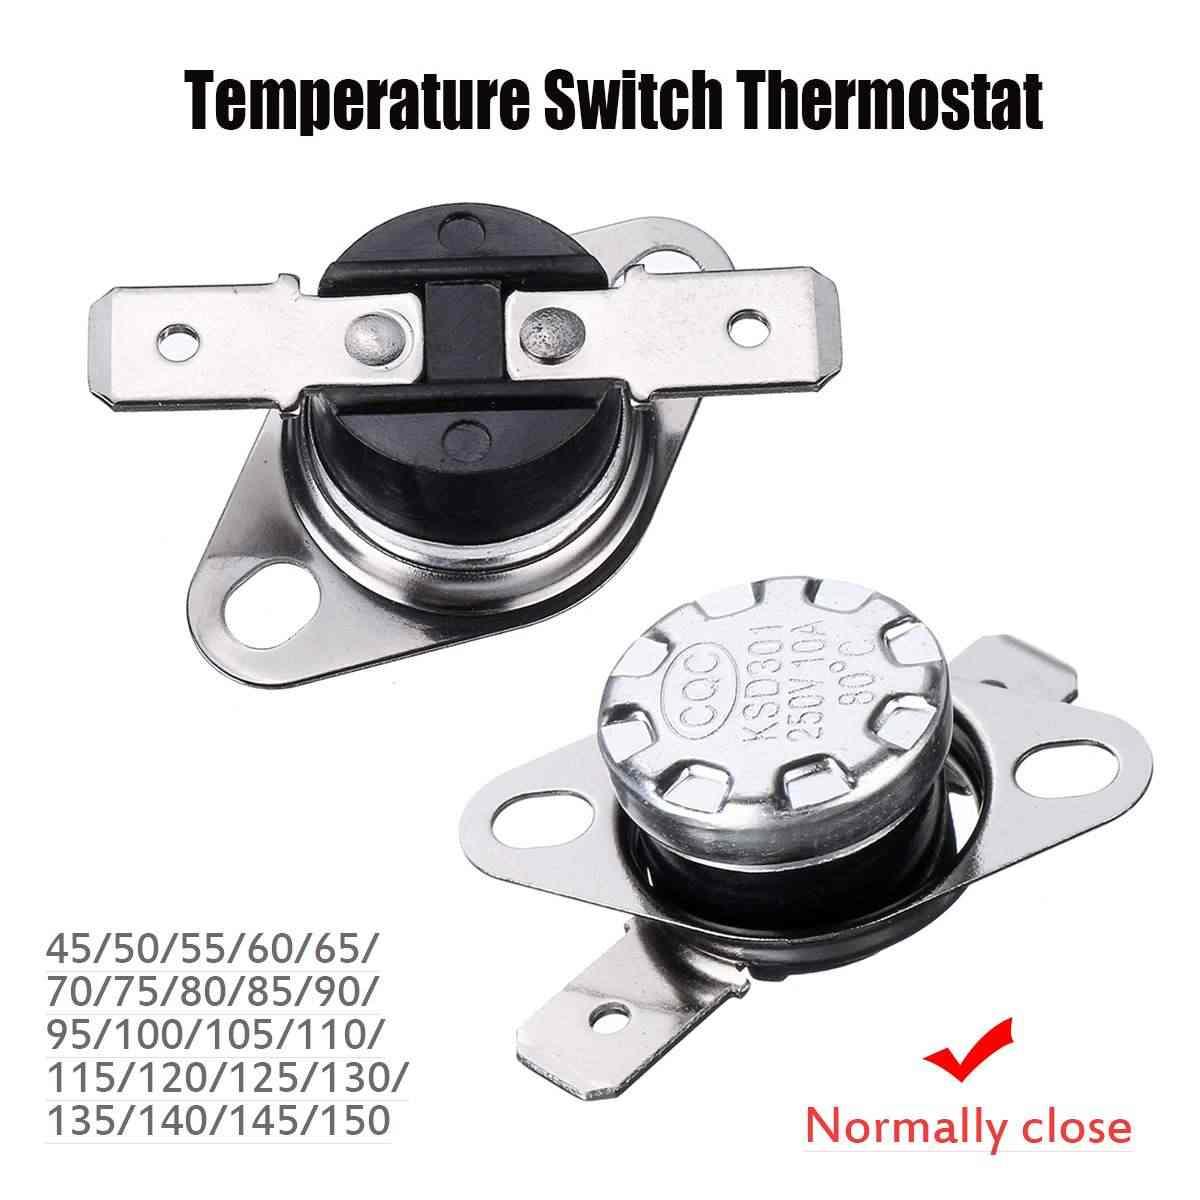 KSD301 10 x Temperature Switch Control Sensor Thermal Thermostat 105°C N.O